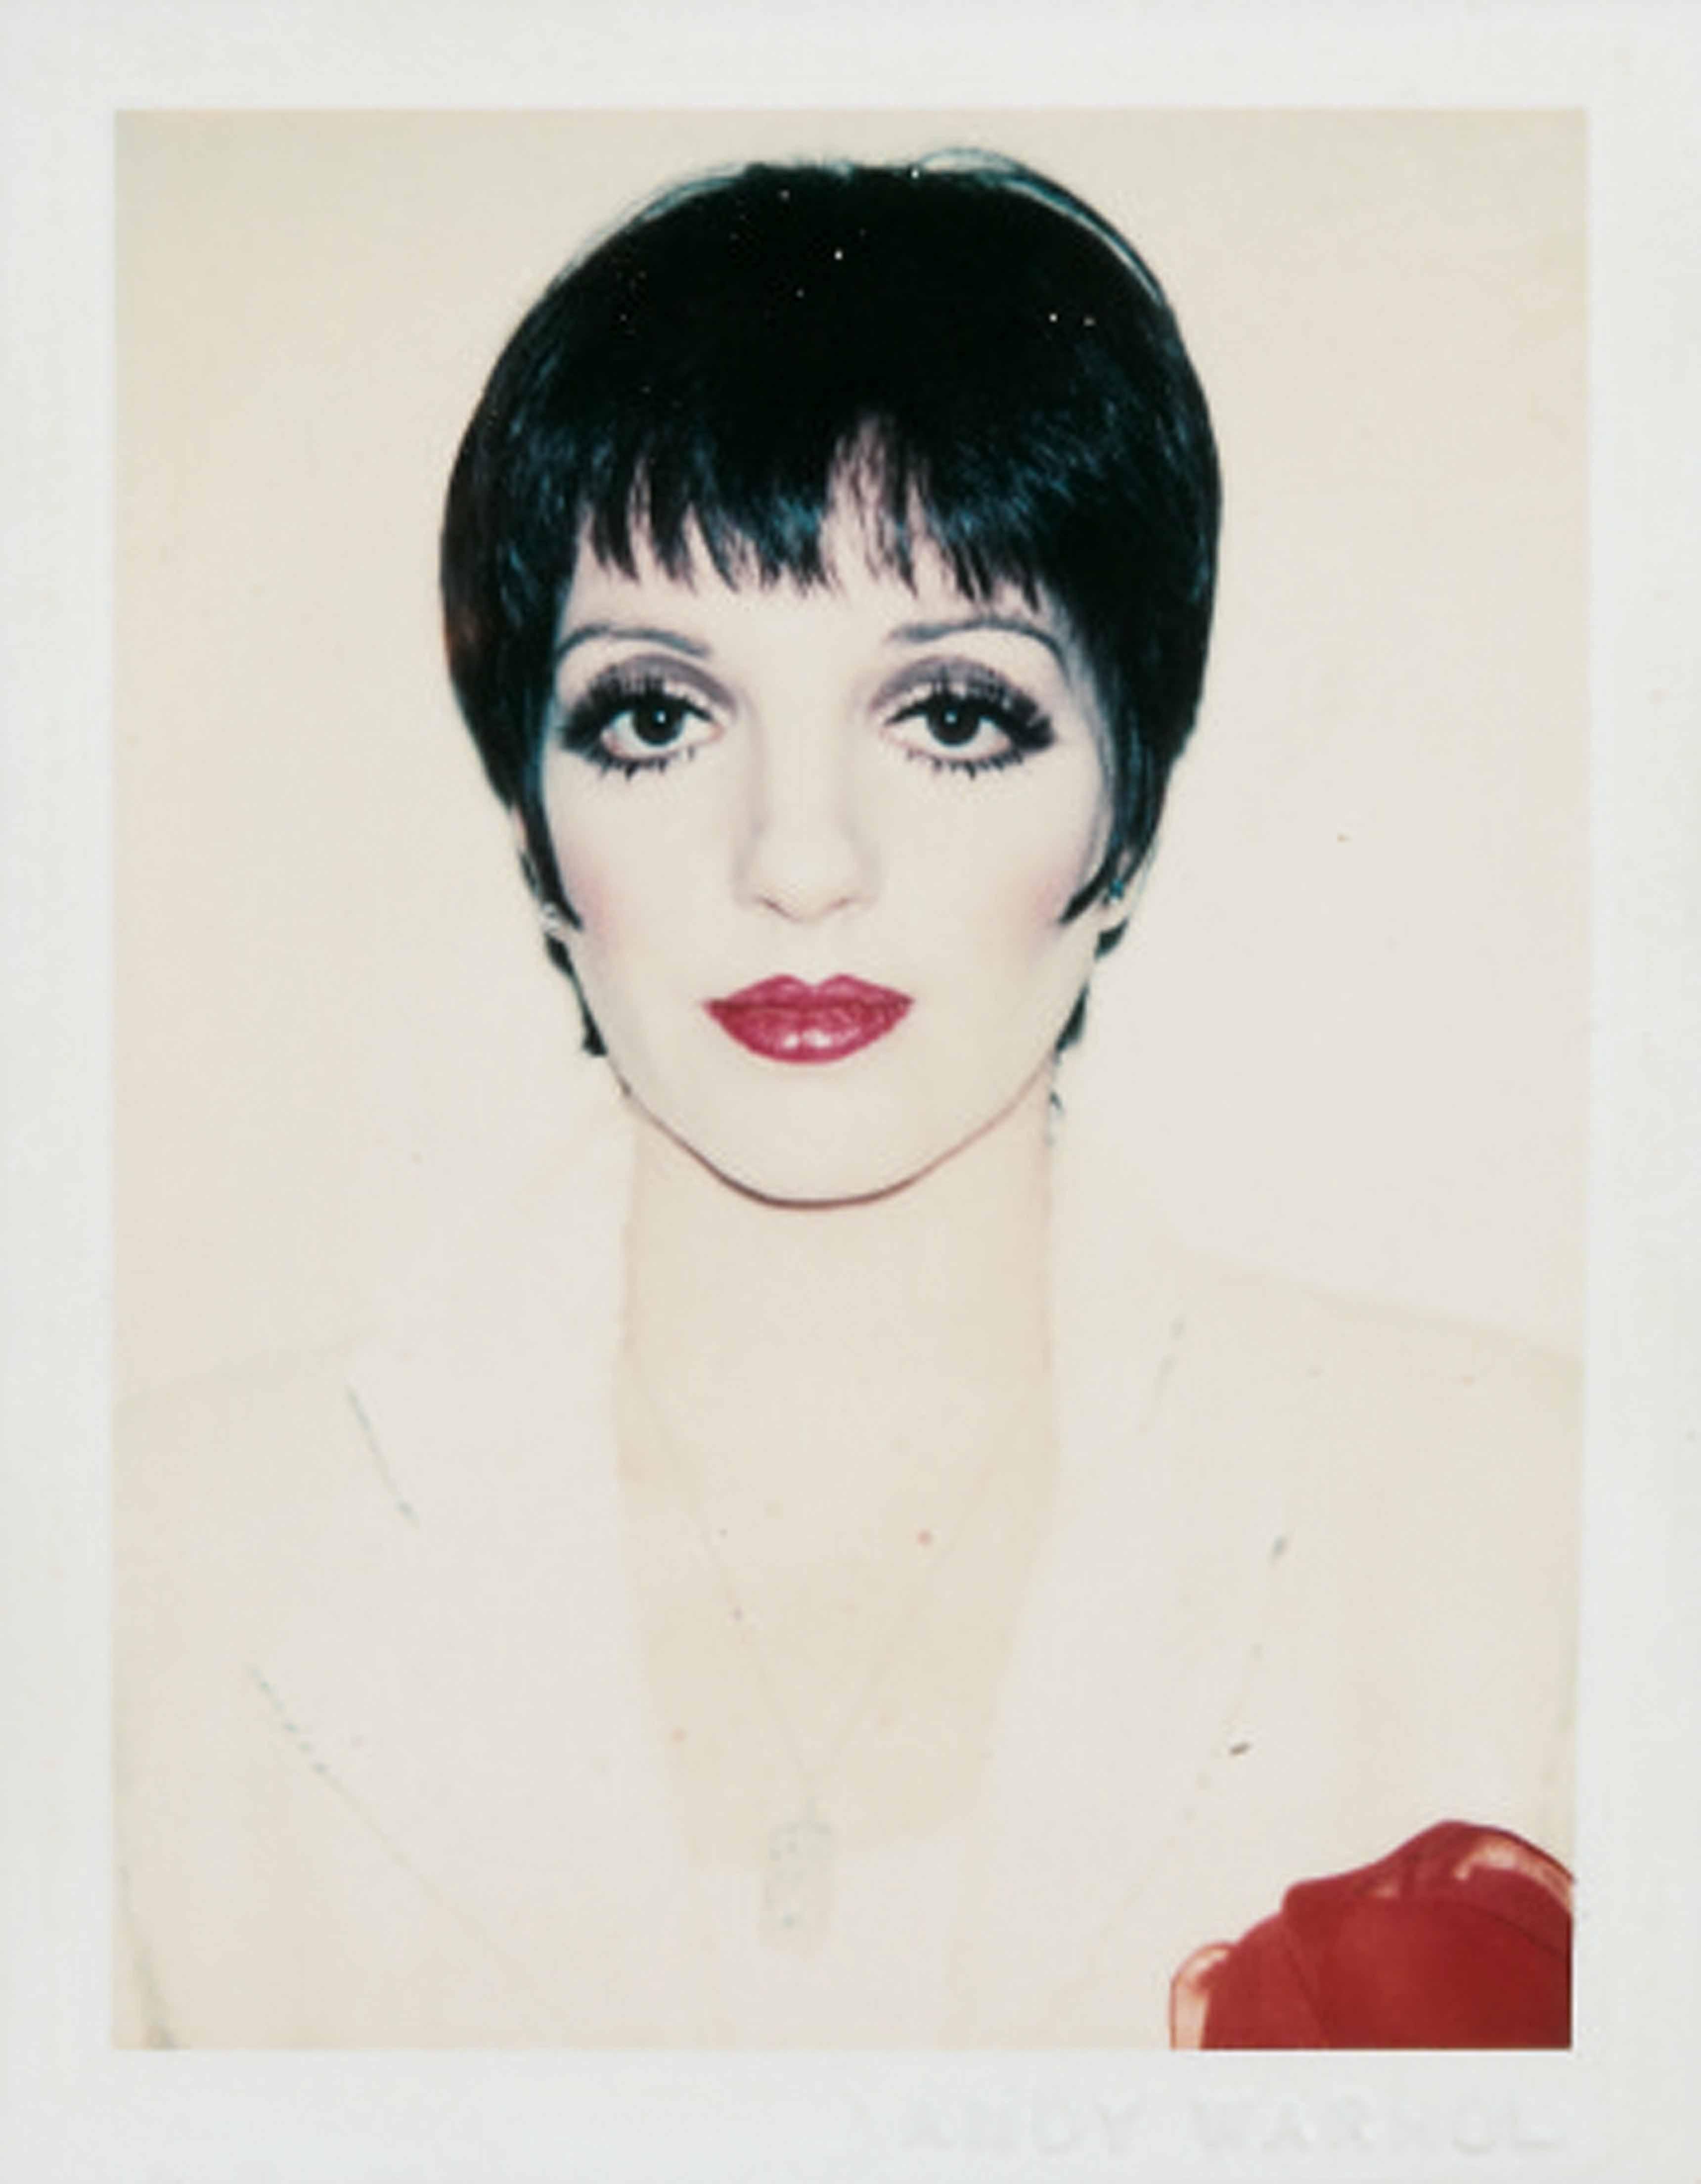 ANDY WARHOL Liza Minnelli, 1978 Estimate: 8,000 - 12,000 - EUR